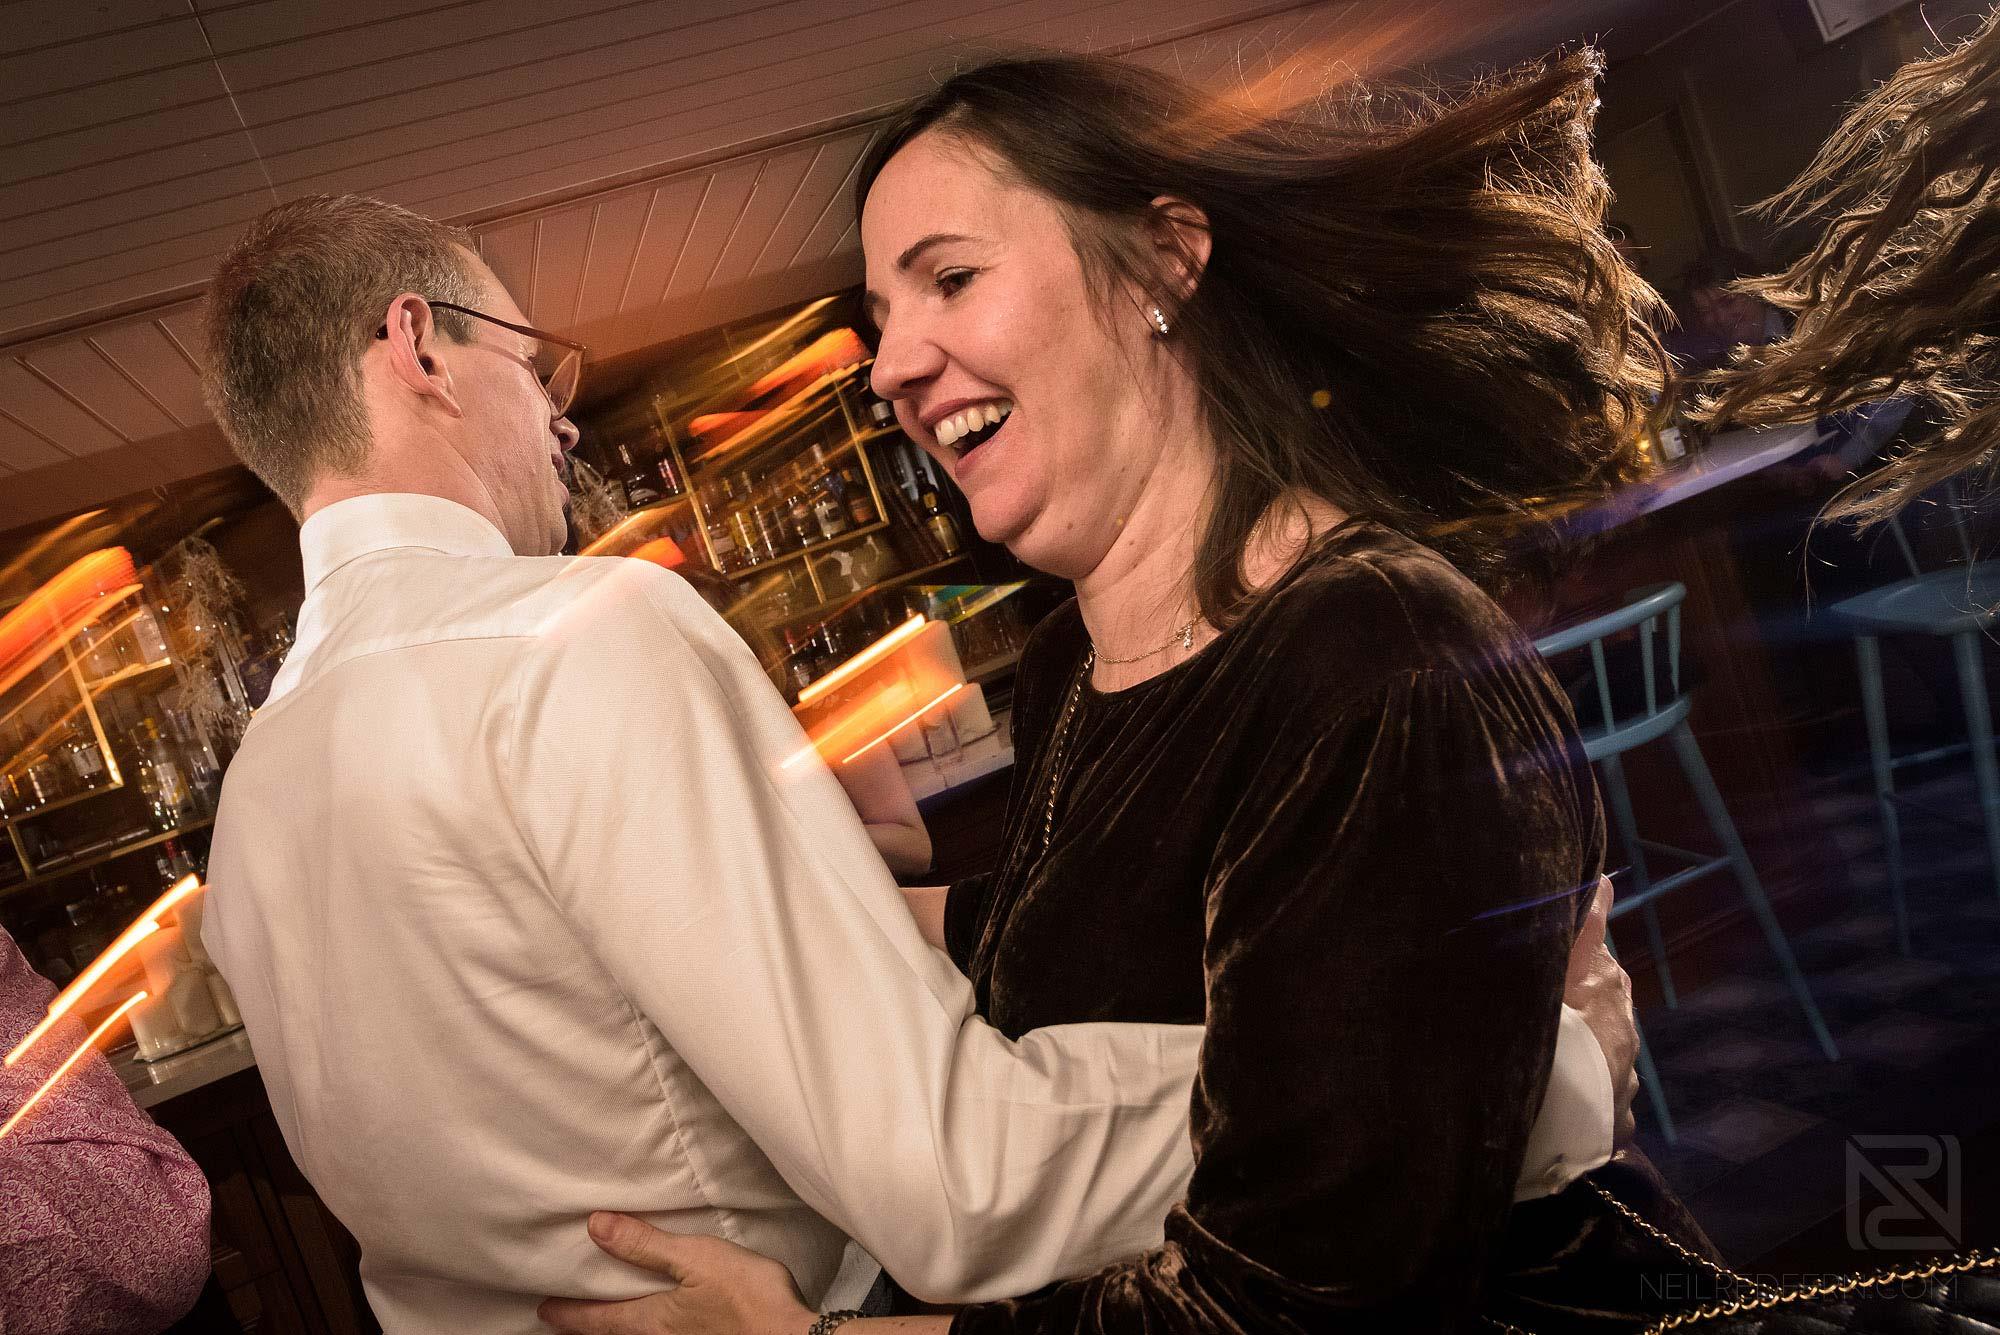 wedding guests dancing at wedding reception